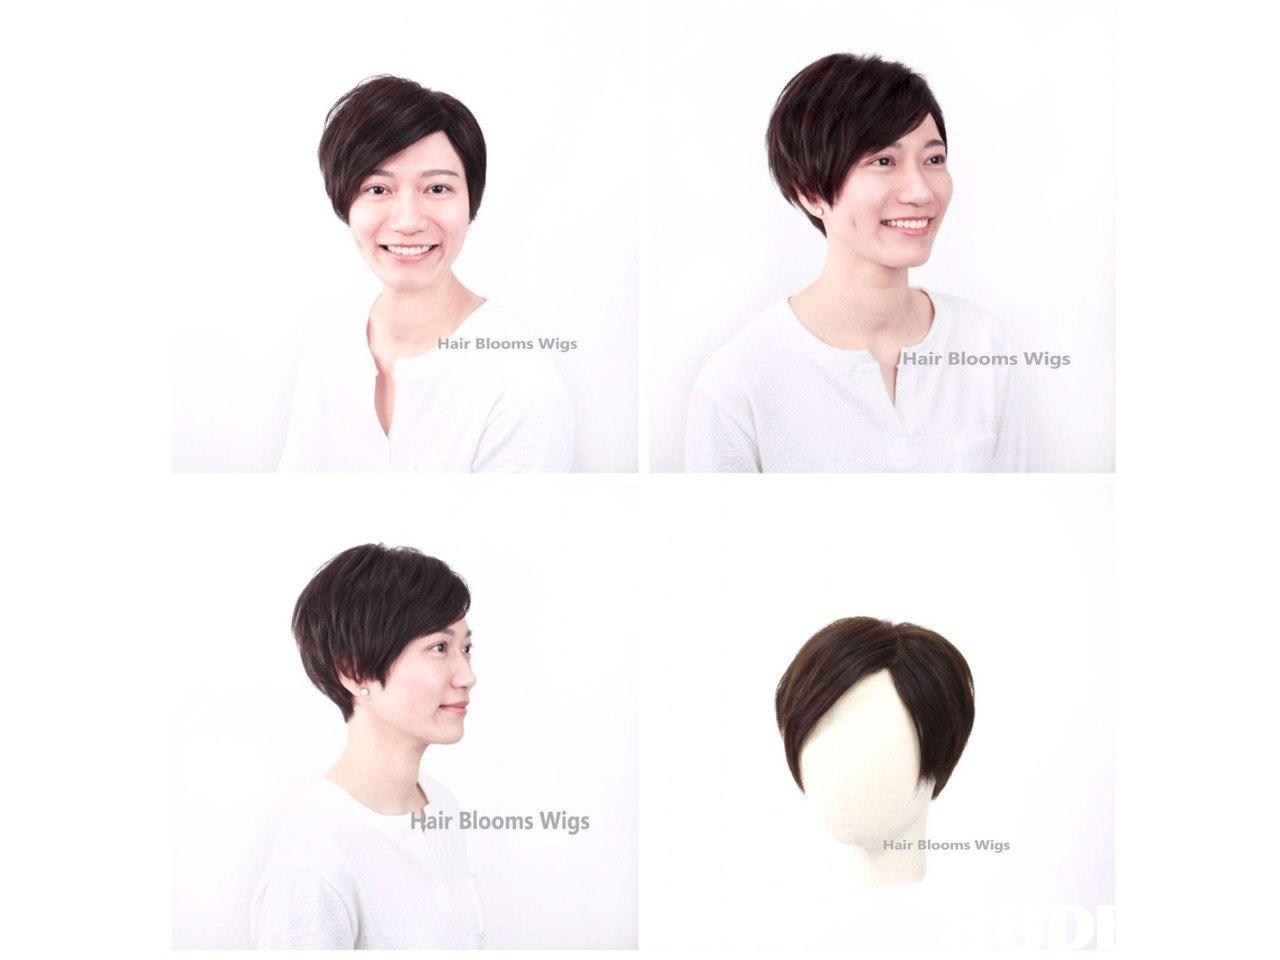 Hair Blooms Wigs Hair Blooms Wigs air Blooms Wigs Hair Blooms Wigs  face,chin,nose,forehead,head